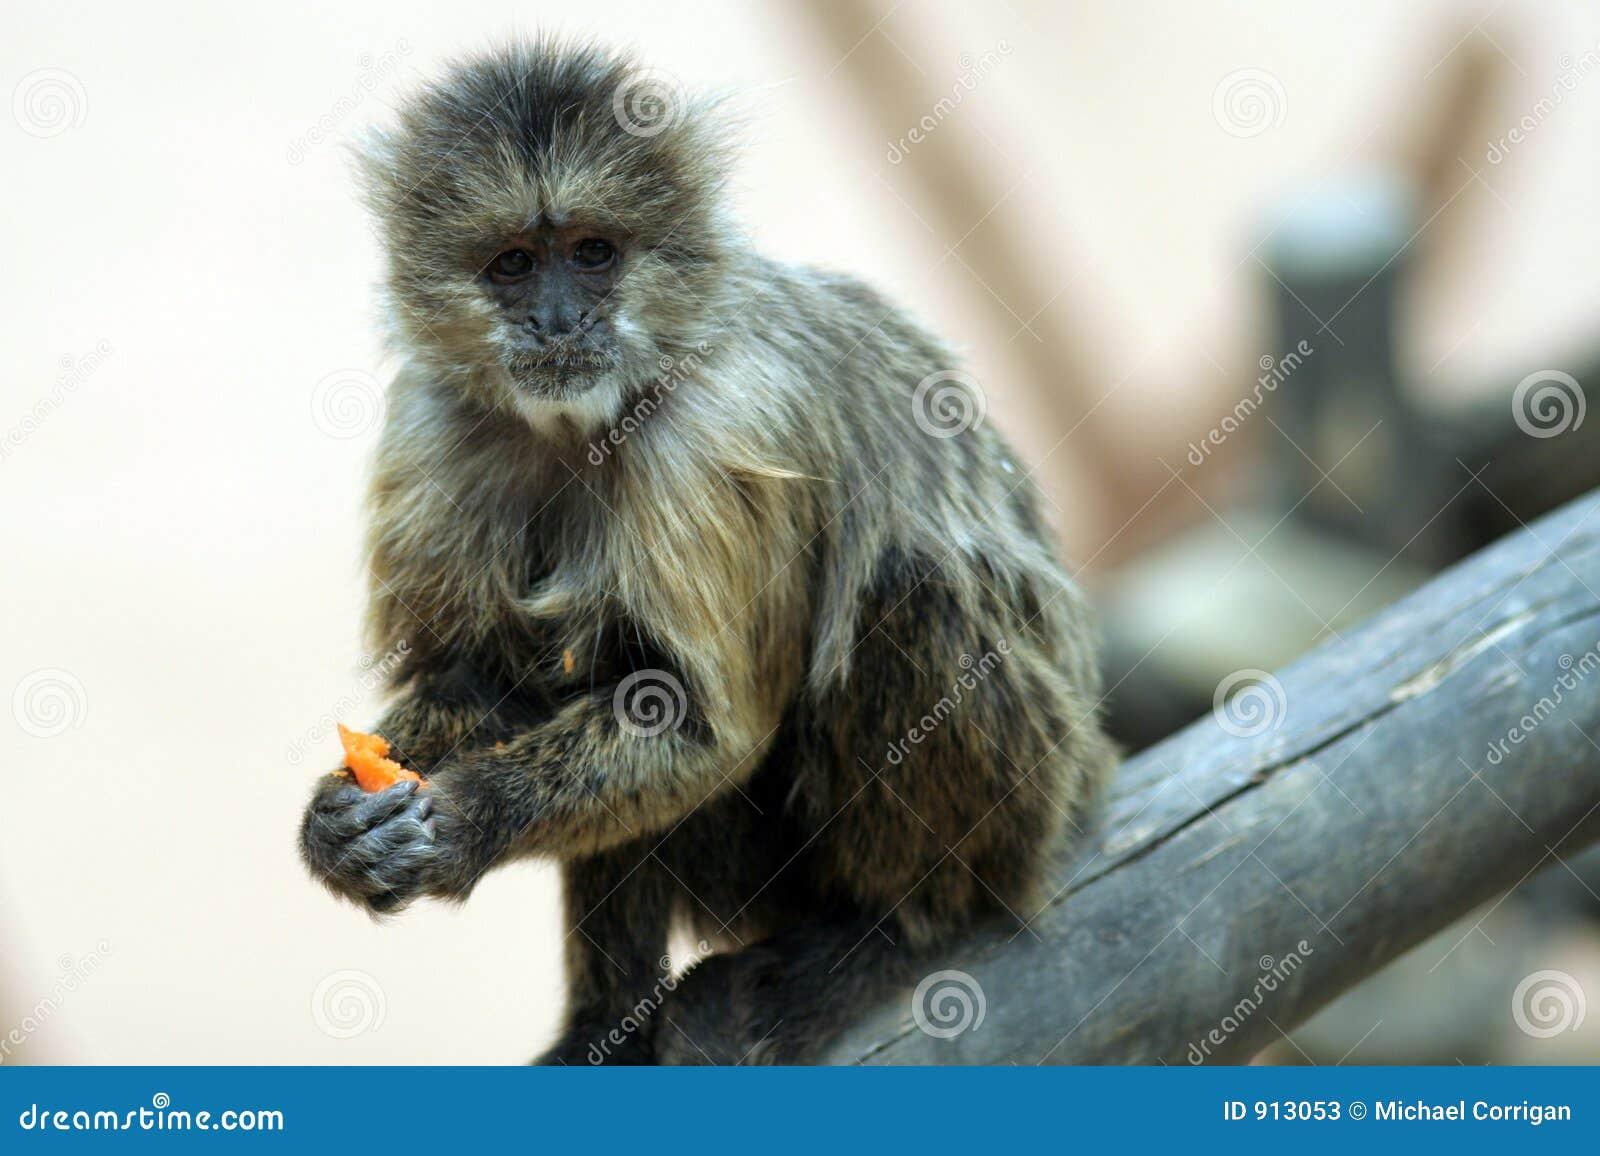 animals in jerez   spain stock photos   image 913053